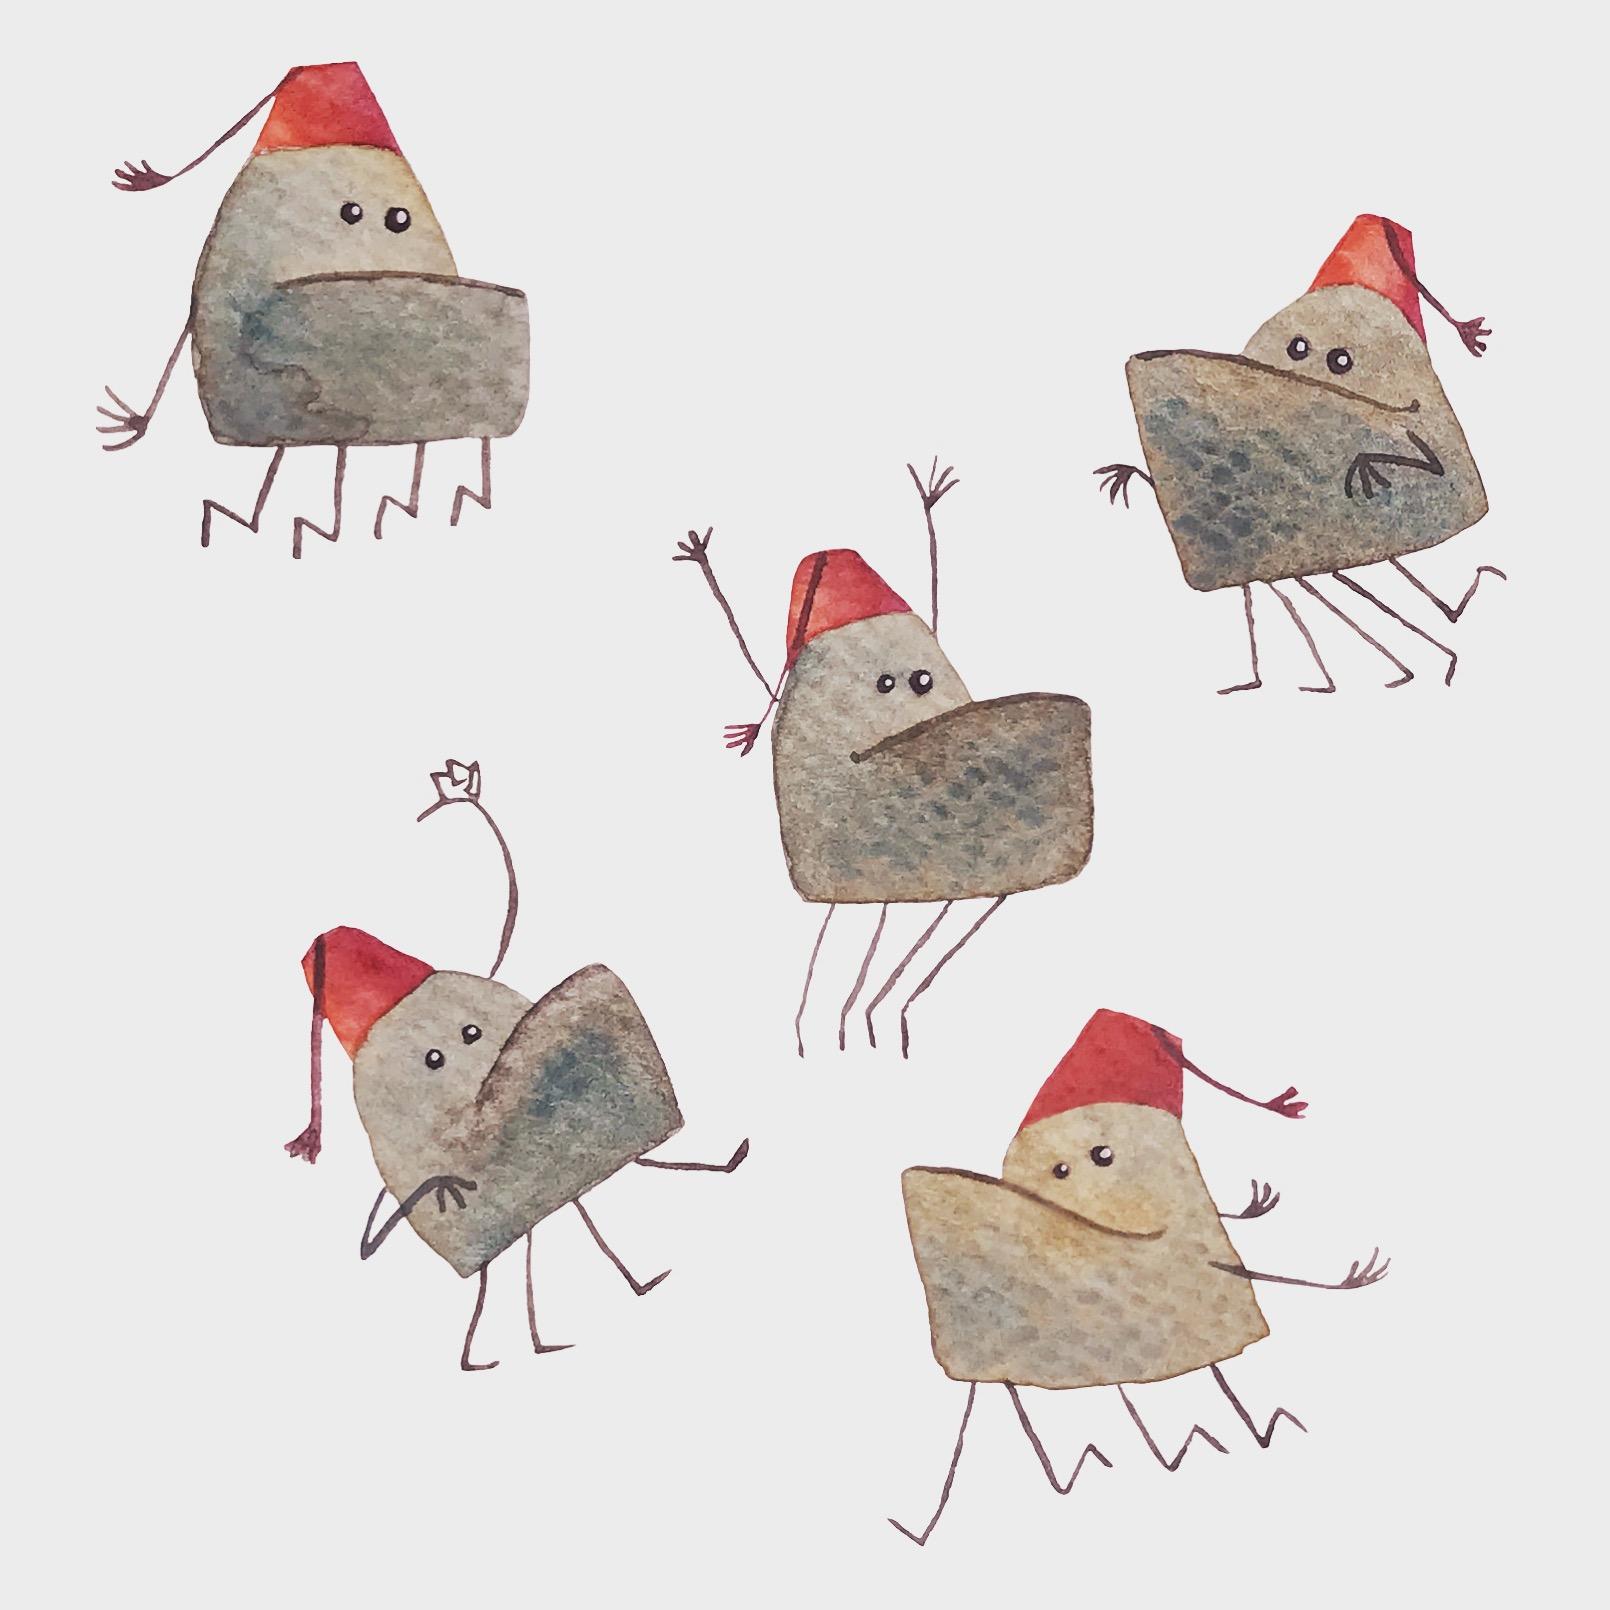 Underbite monsters with fez